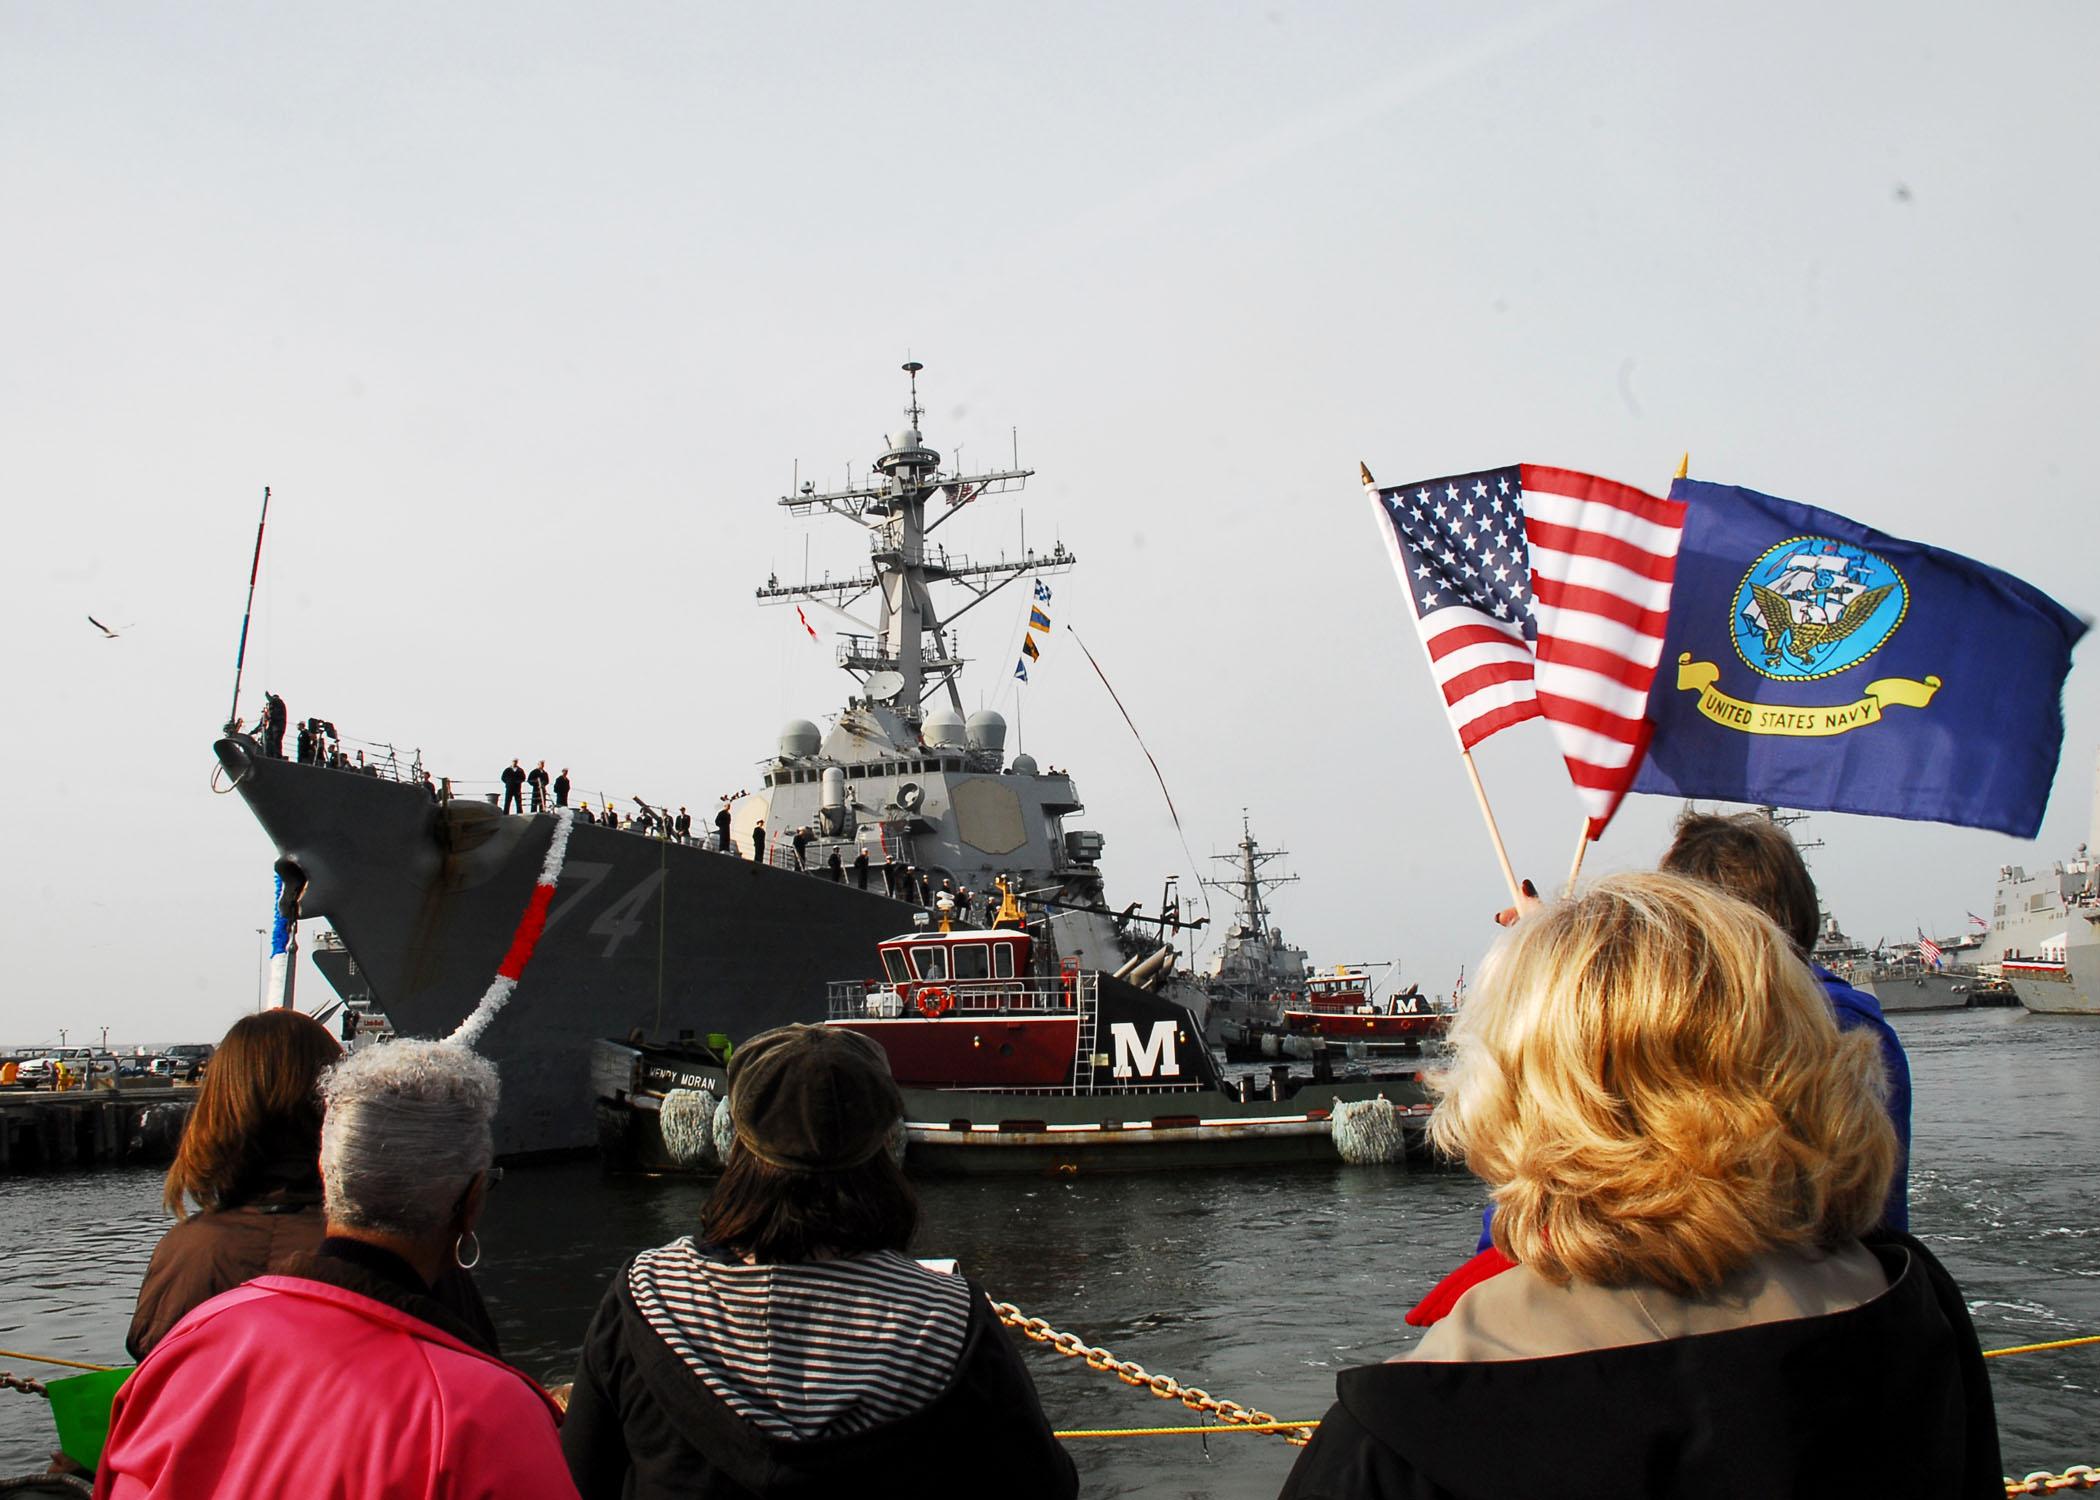 USS McFAUL DDG-74 02.12.2012  NorfolkBild: U.S. Navy